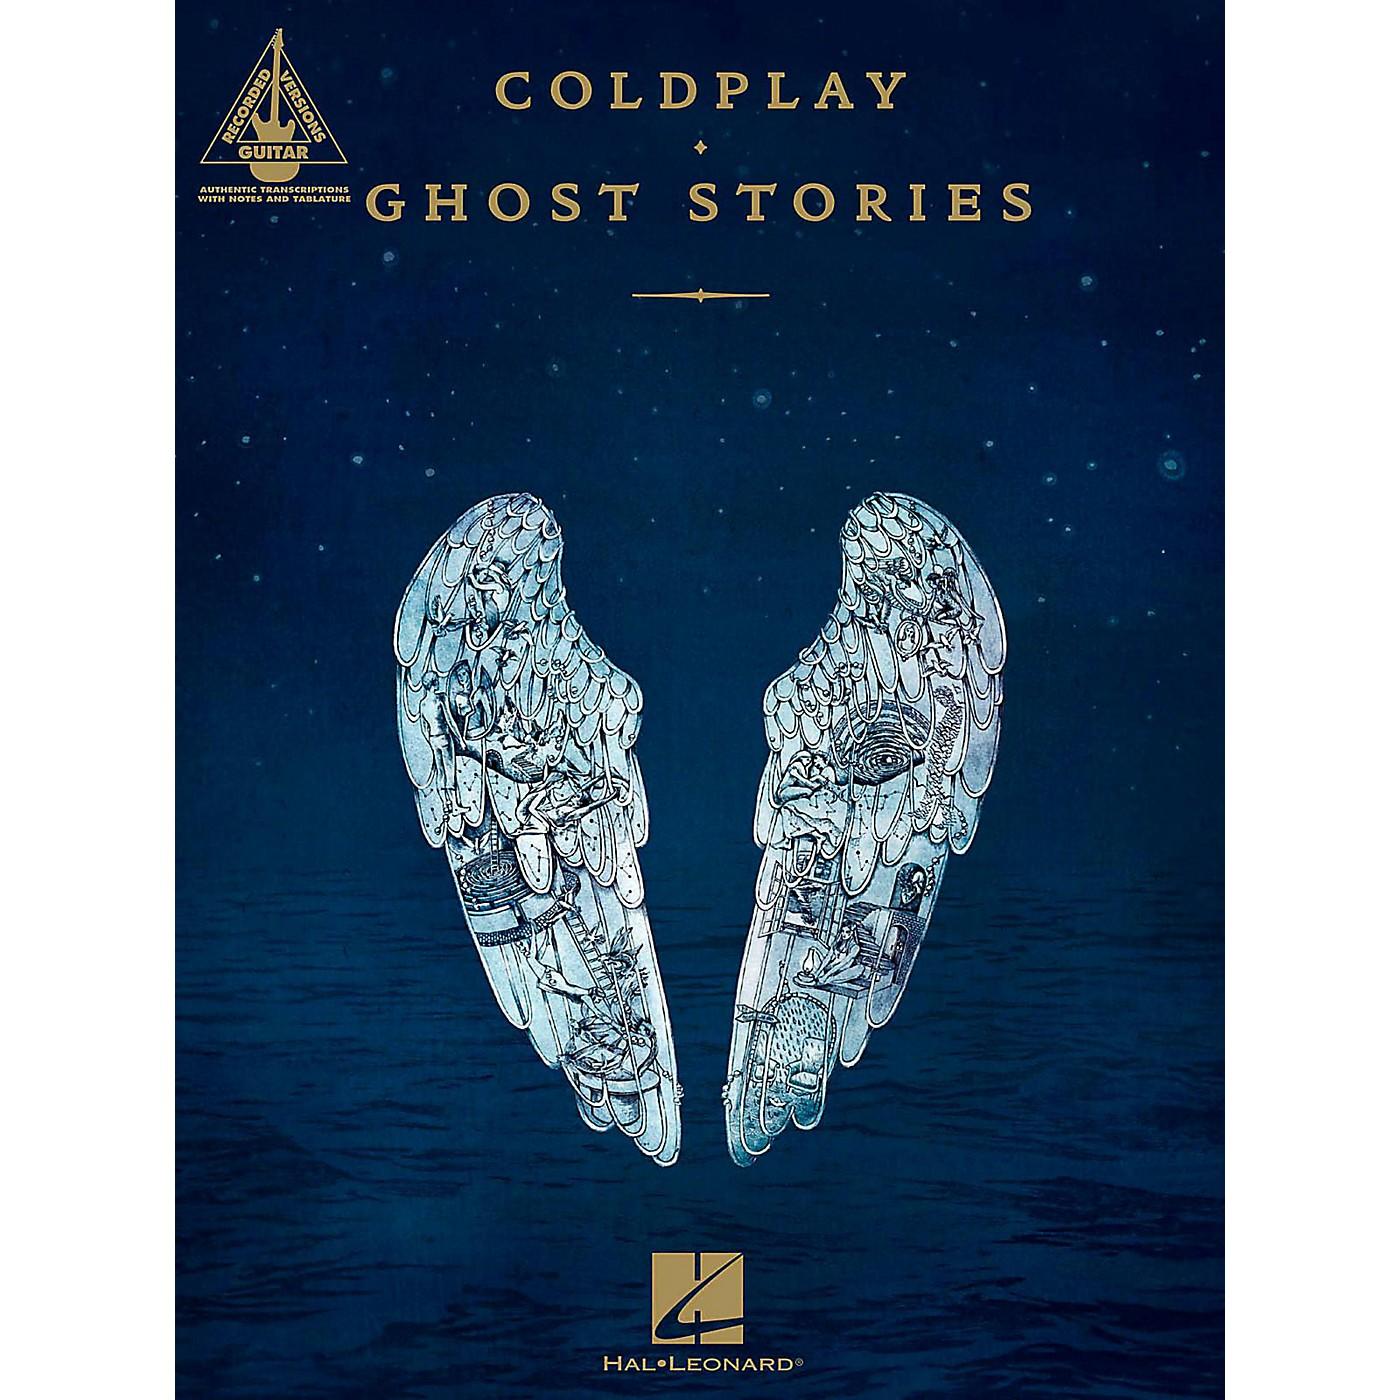 Hal Leonard Coldplay - Ghost Stories Guitar Tab Songbook thumbnail